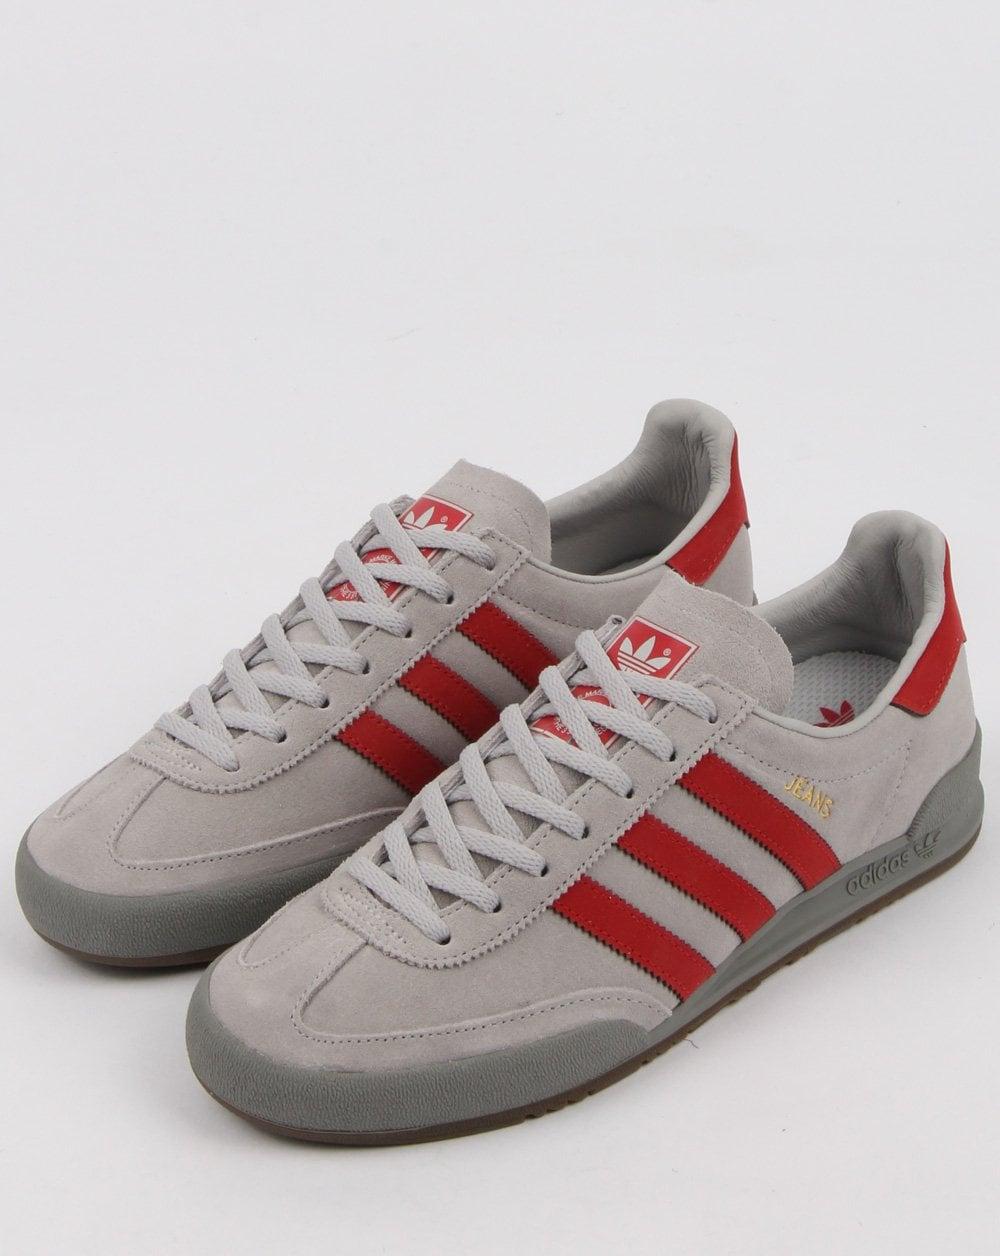 9ba9f435c33 adidas jeans grey off 64% - www.boulangerie-clerault-labaule.com